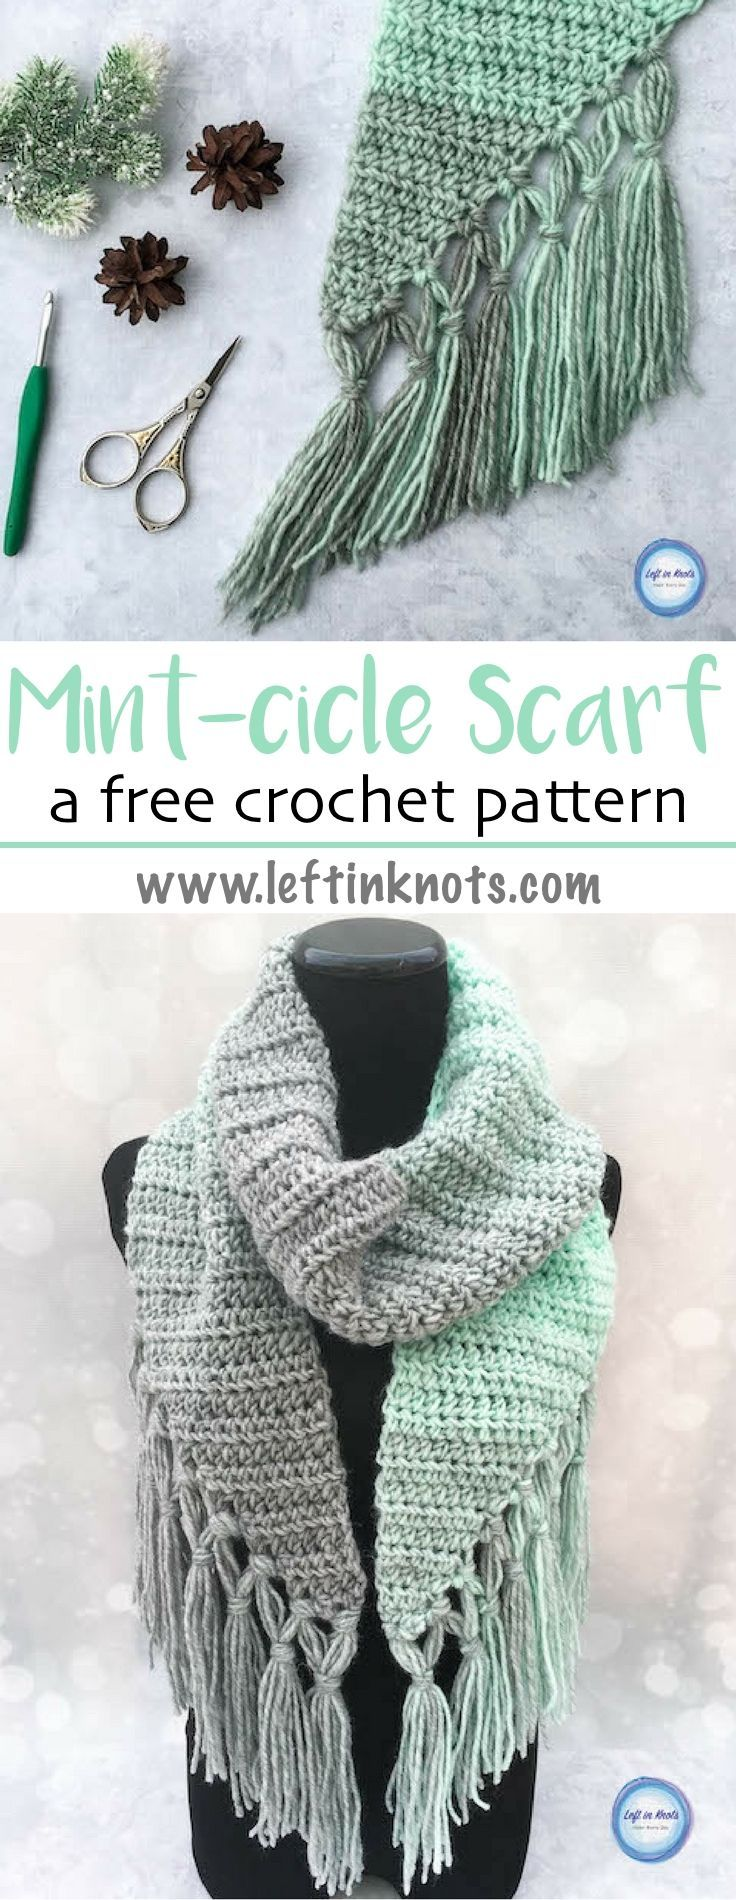 Mint-cicle Scarf Crochet Pattern | Tejido, Crochet bufanda y Labores